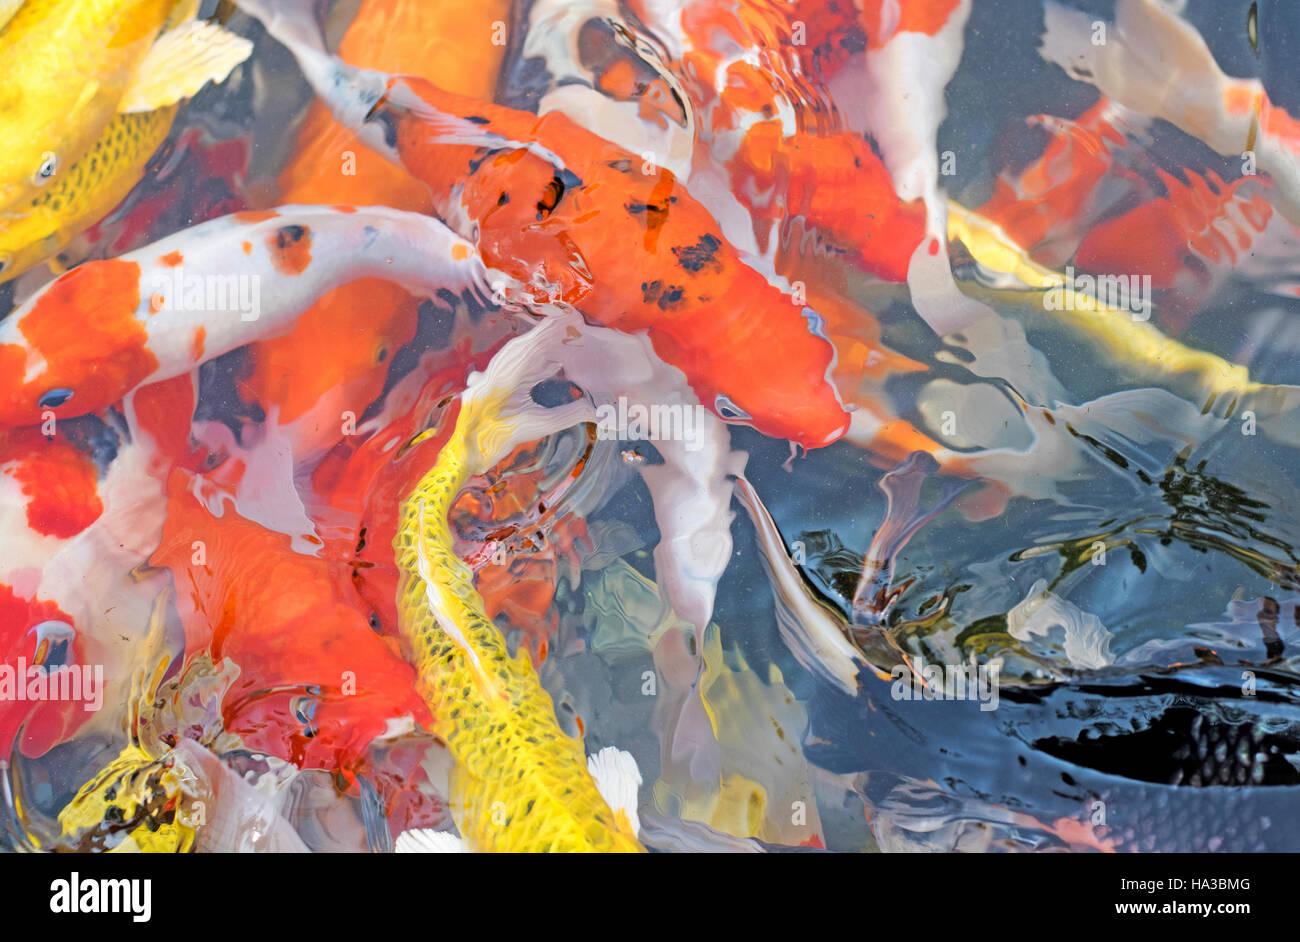 Red Koi Fish Stock Photos & Red Koi Fish Stock Images - Alamy